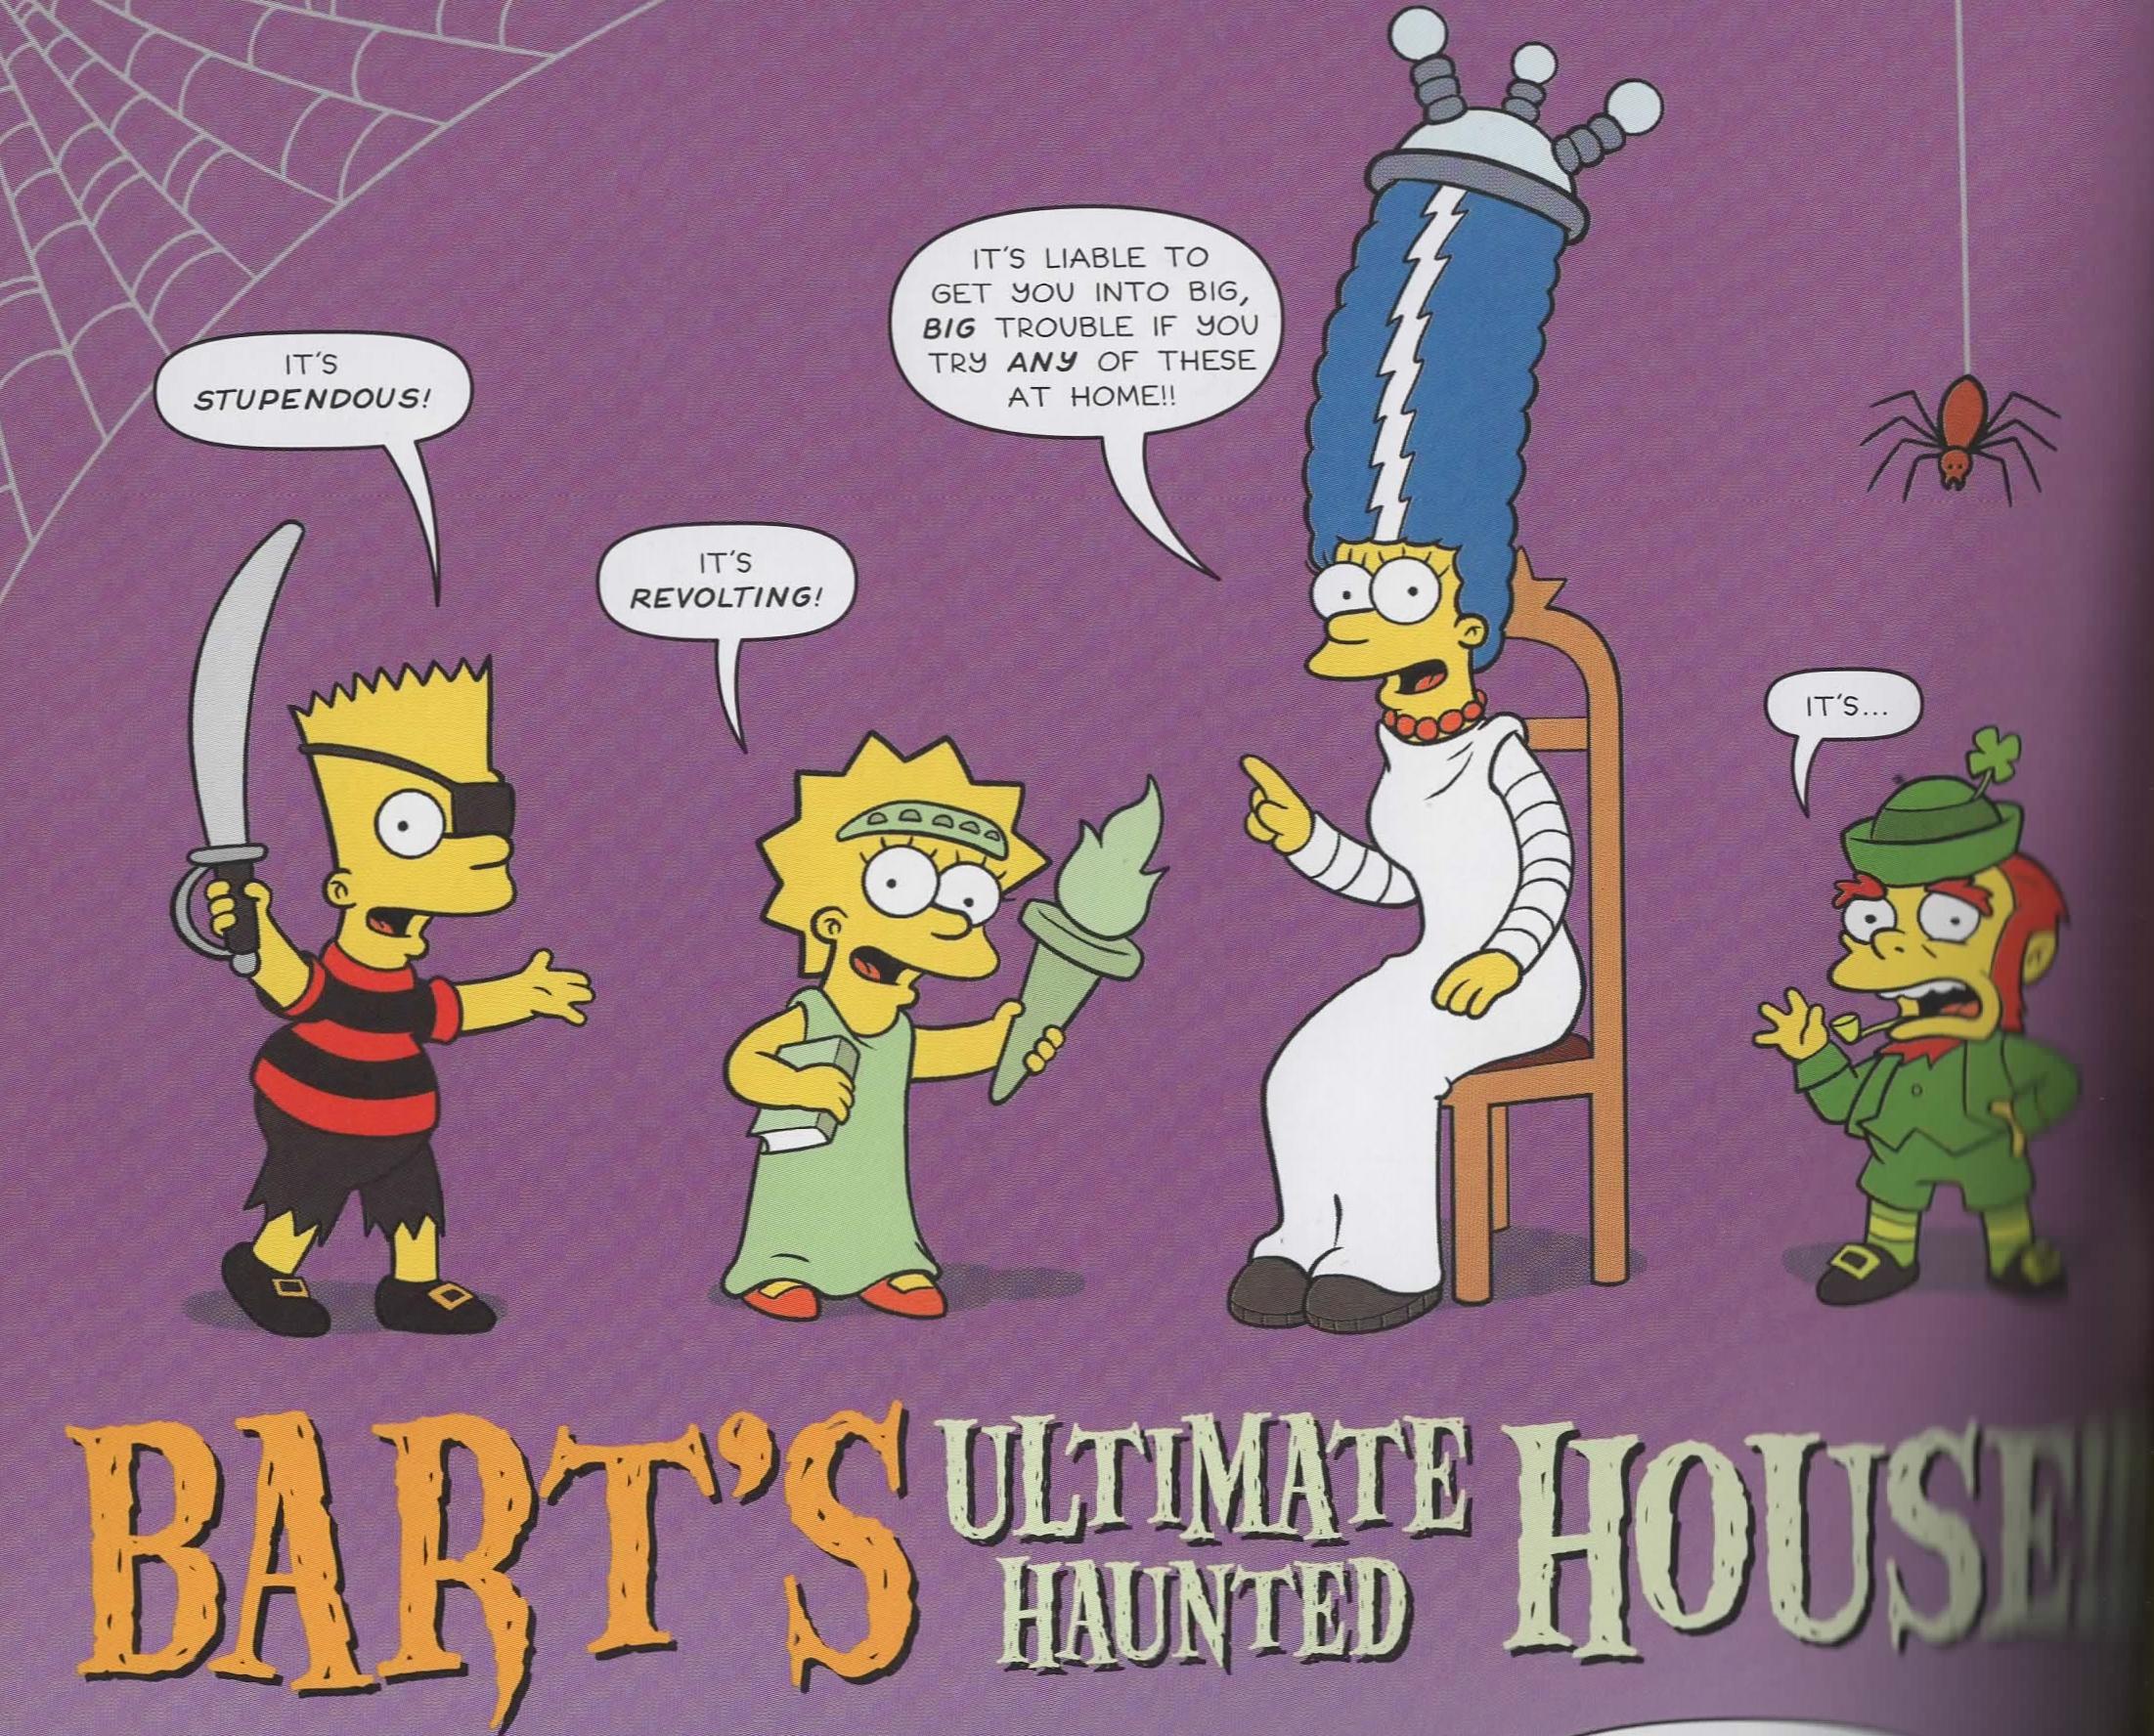 Bart's Ultimate Haunted House.jpg